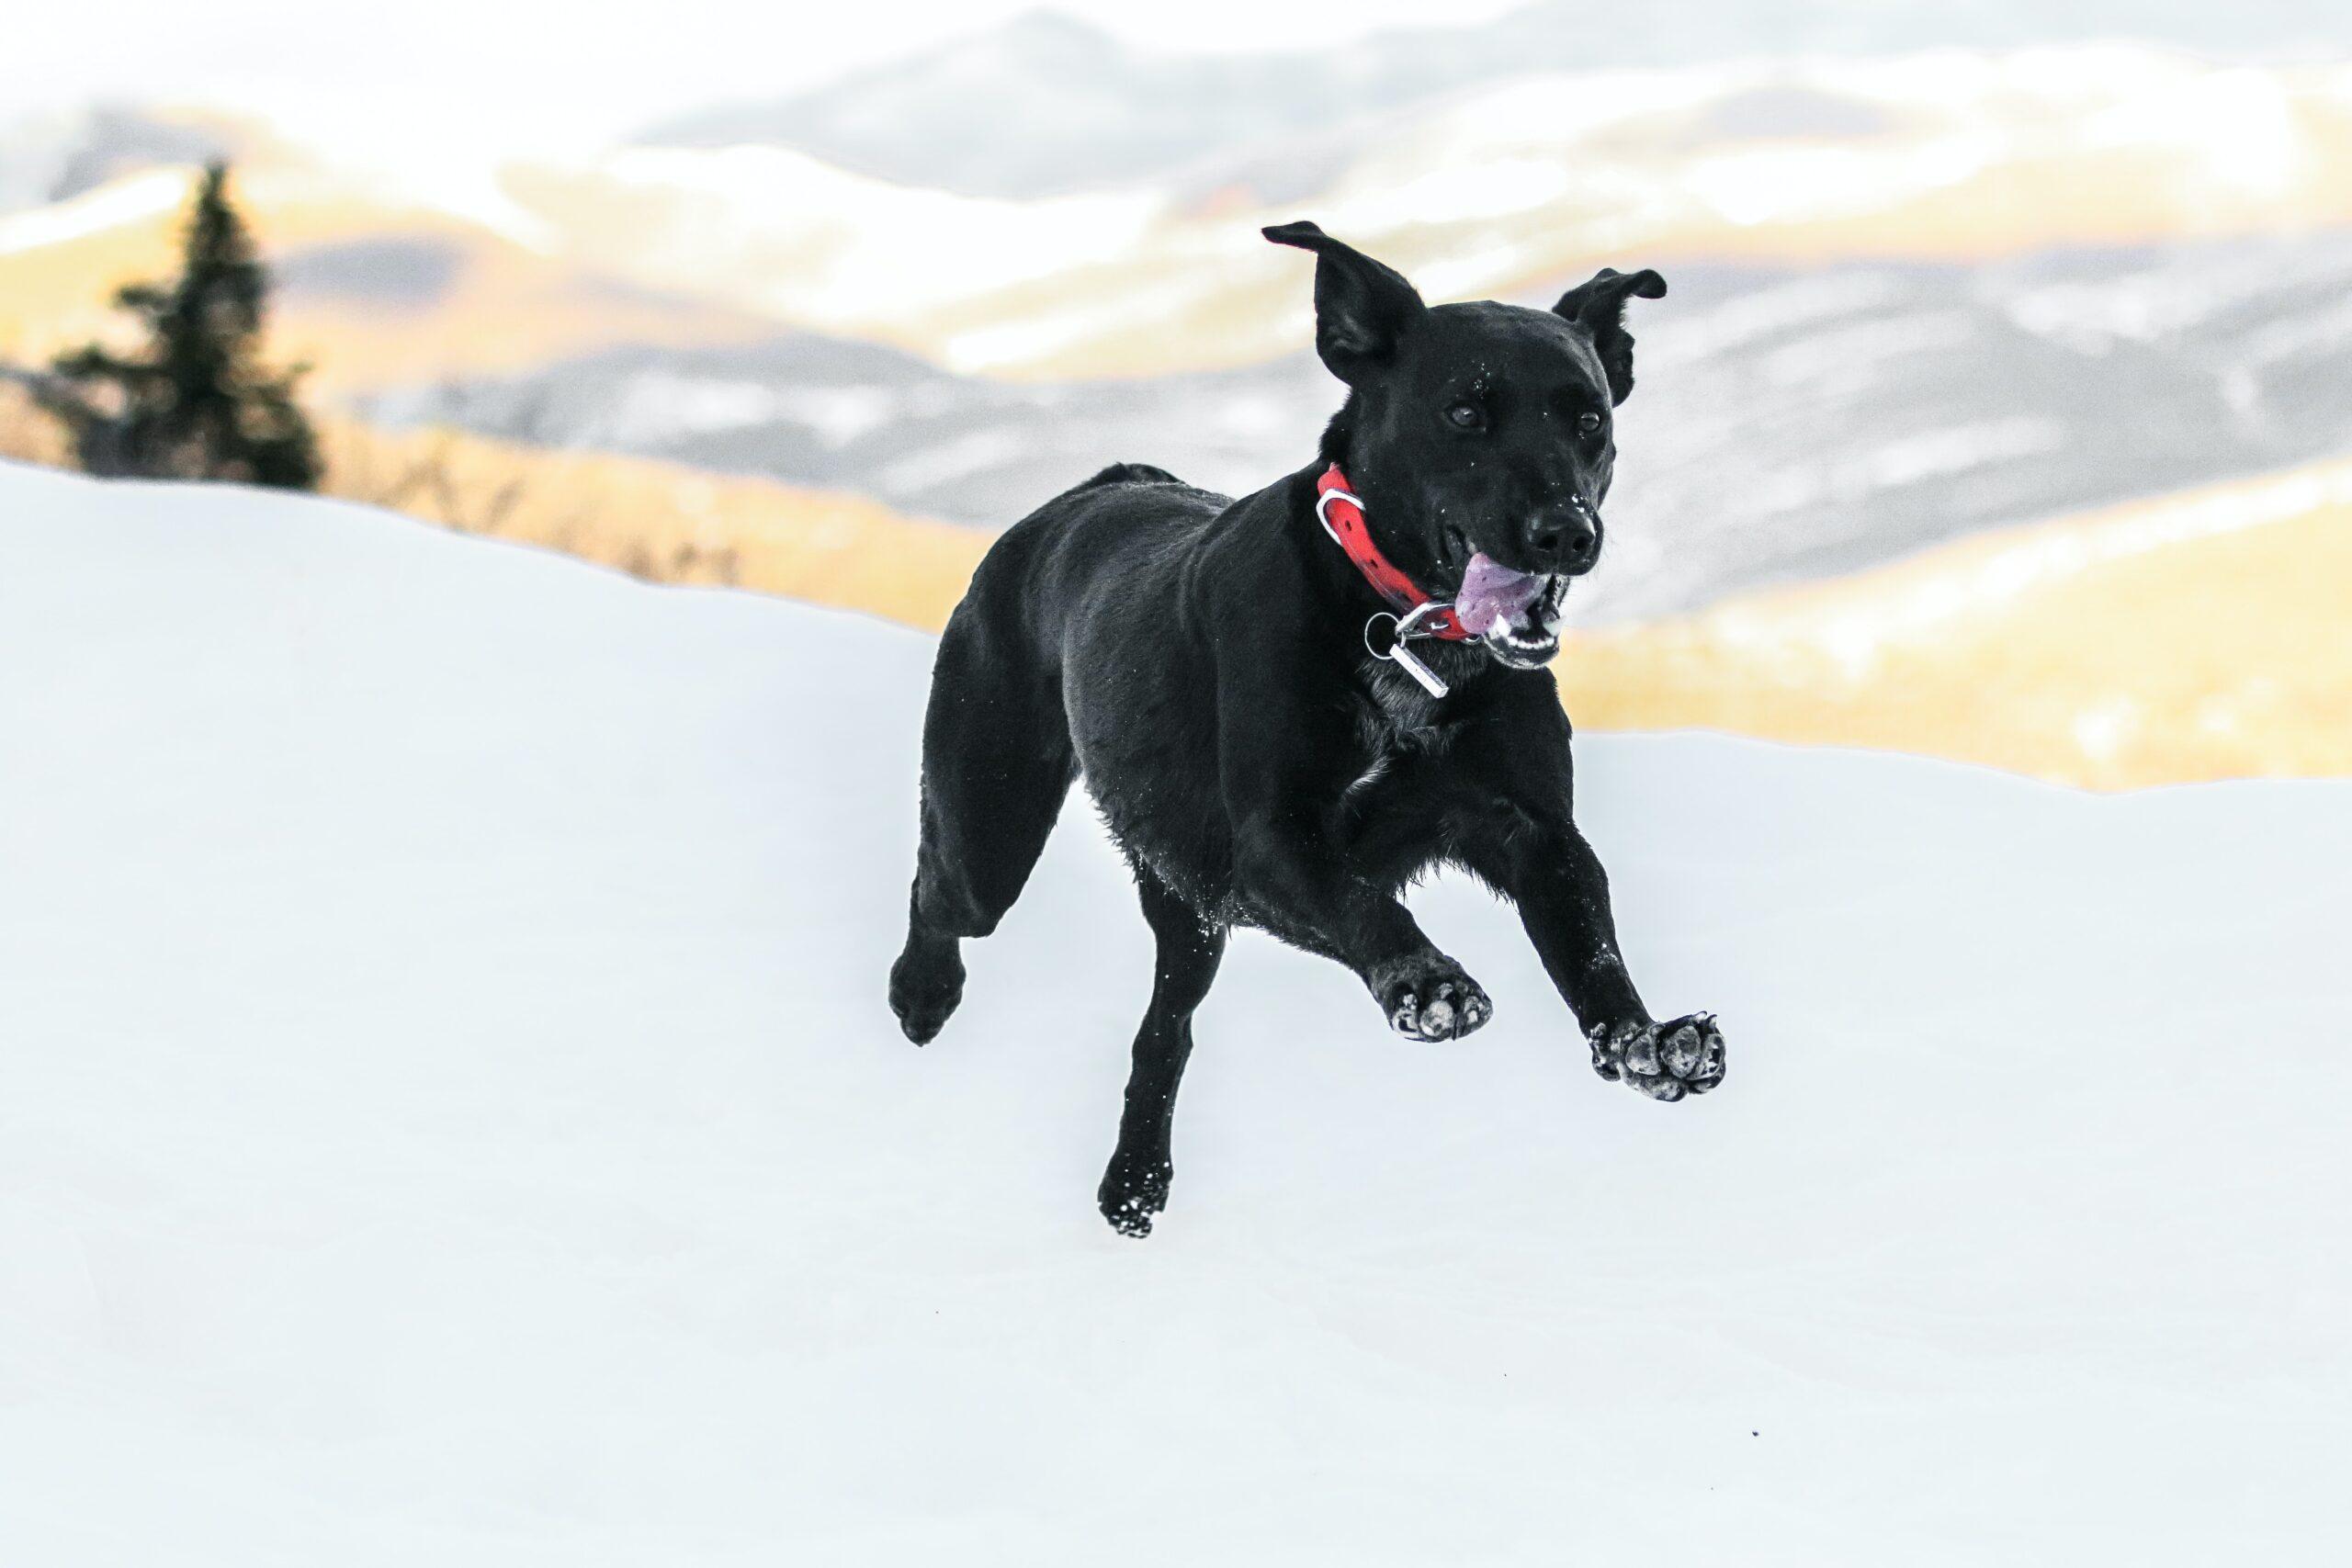 patrick-hendry-black dog in full sprint run-unsplash